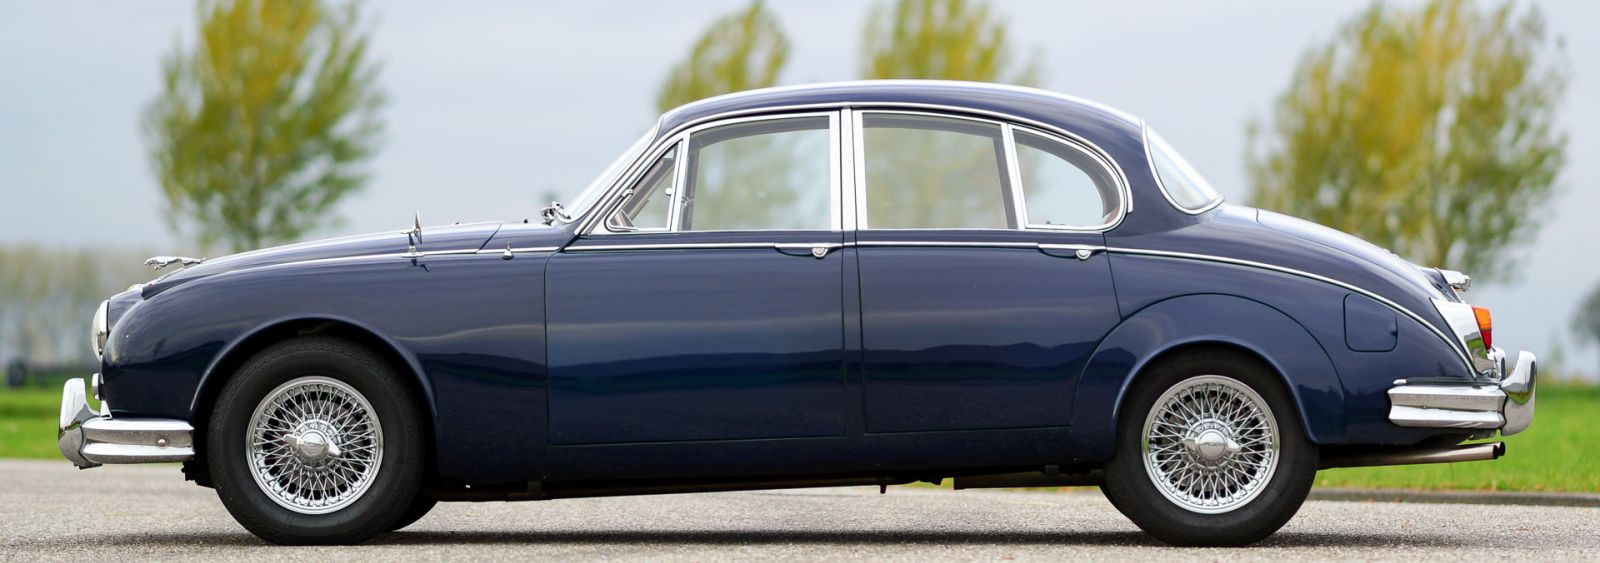 Jaguar Mk II 3.8 Litre, 1960 - Classicargarage - FR